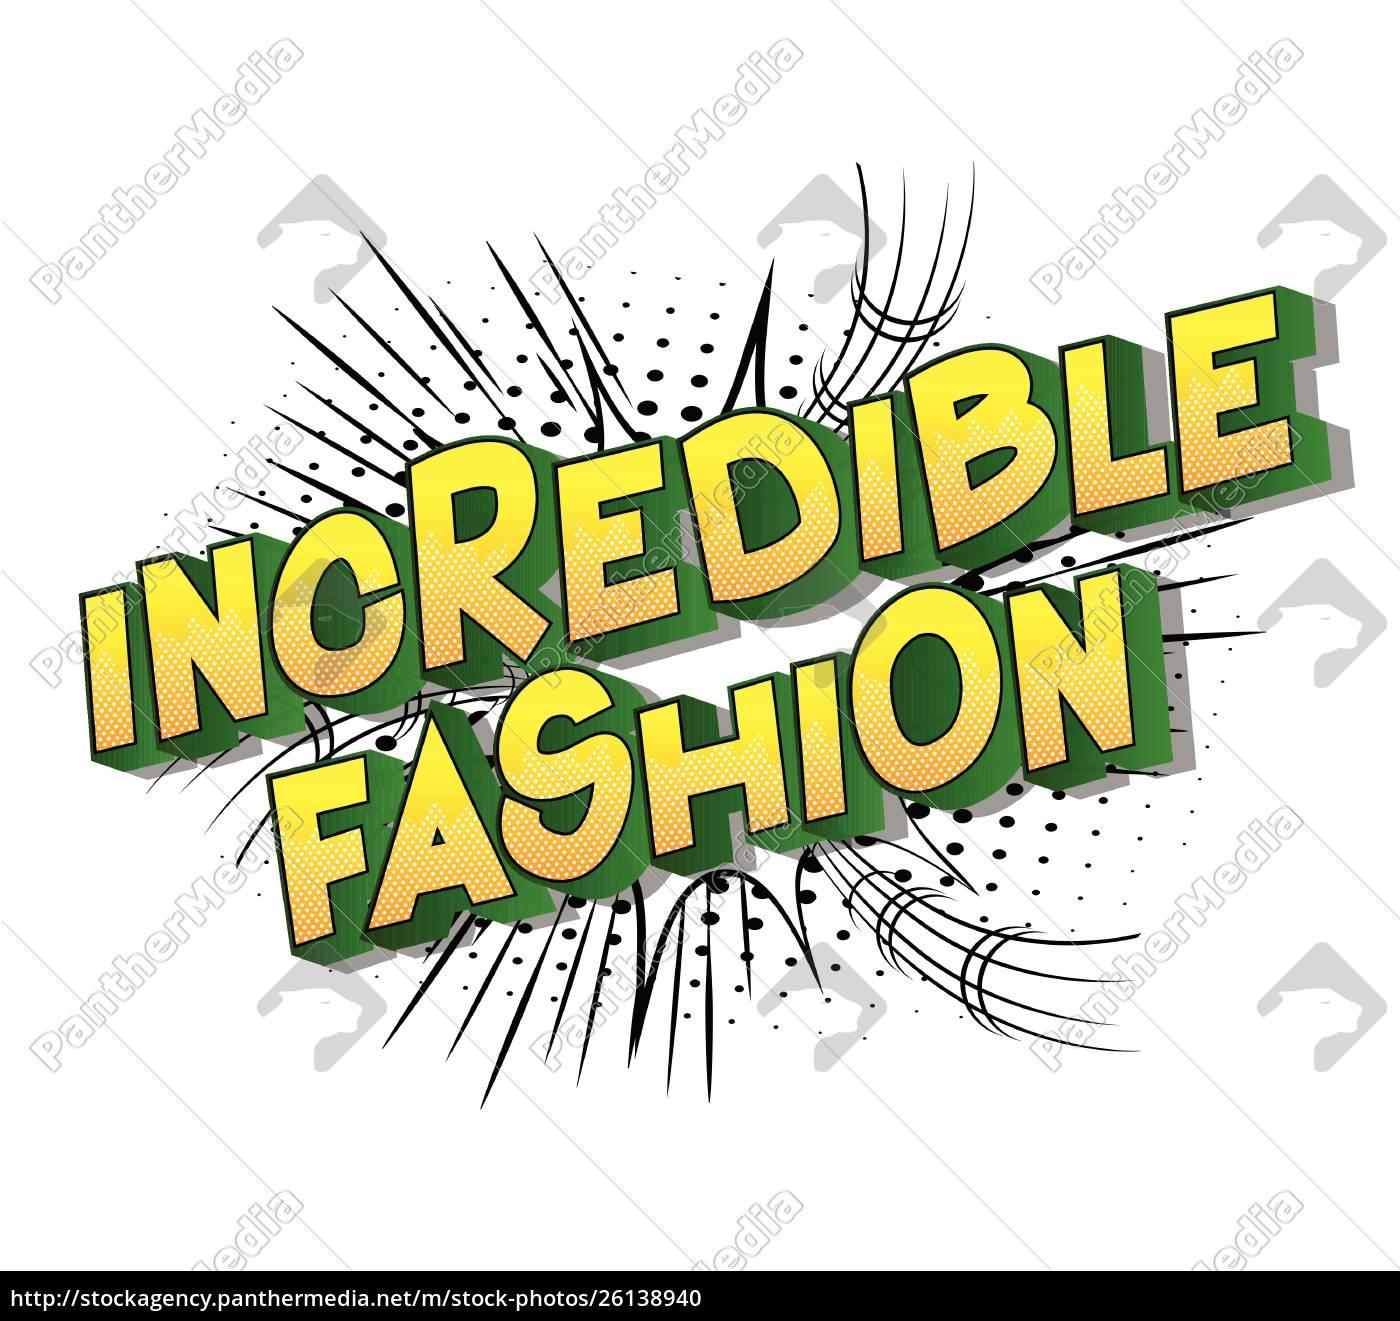 incredible, fashion, -, comic, book, style - 26138940